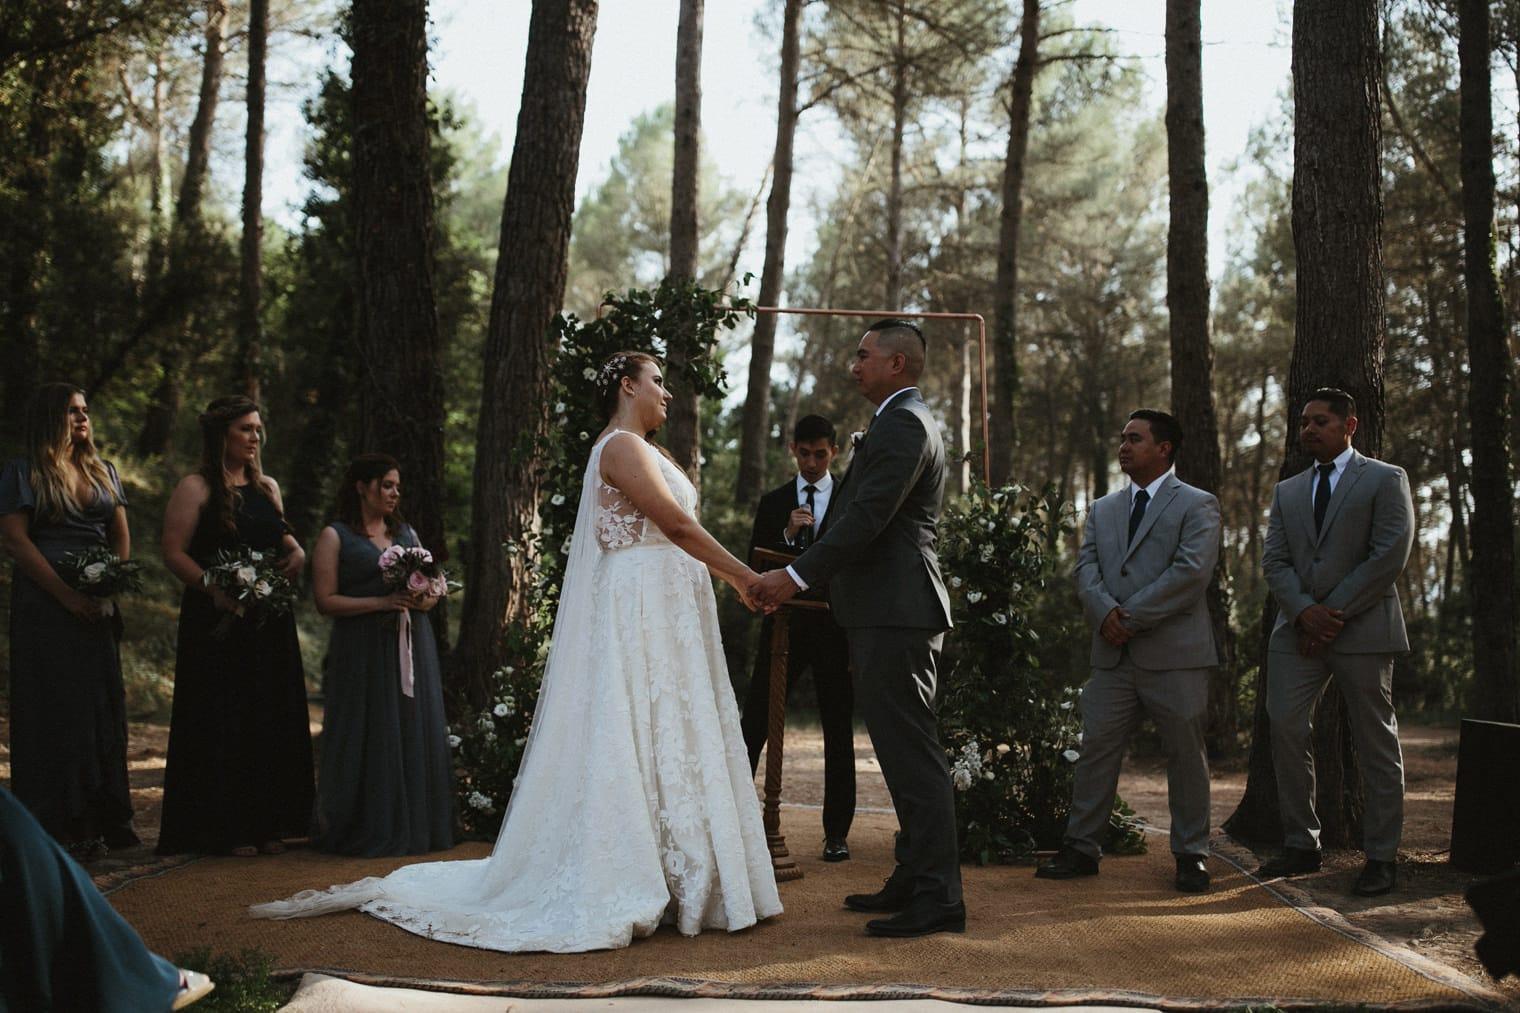 Outdoor forest ceremony in Spain at la garriga de castelladral